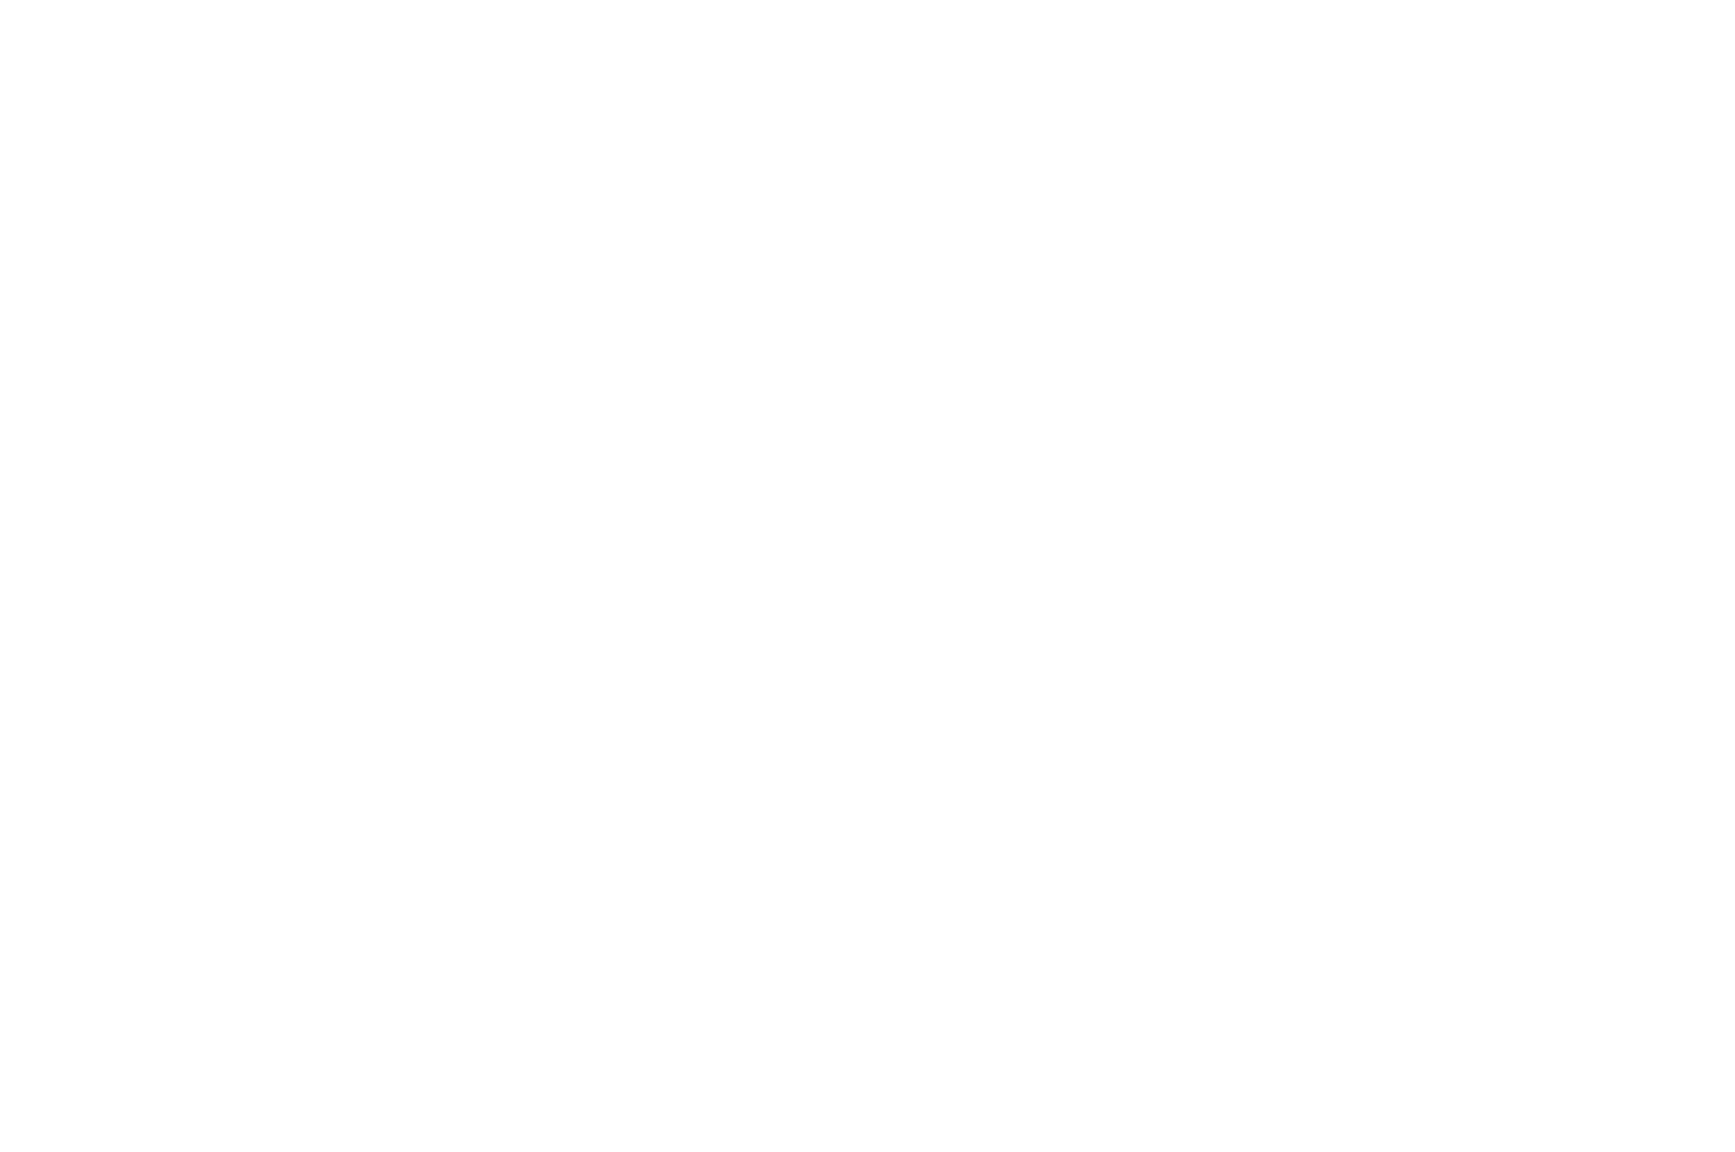 WINNER - California International Shorts Festival Winter - 2020